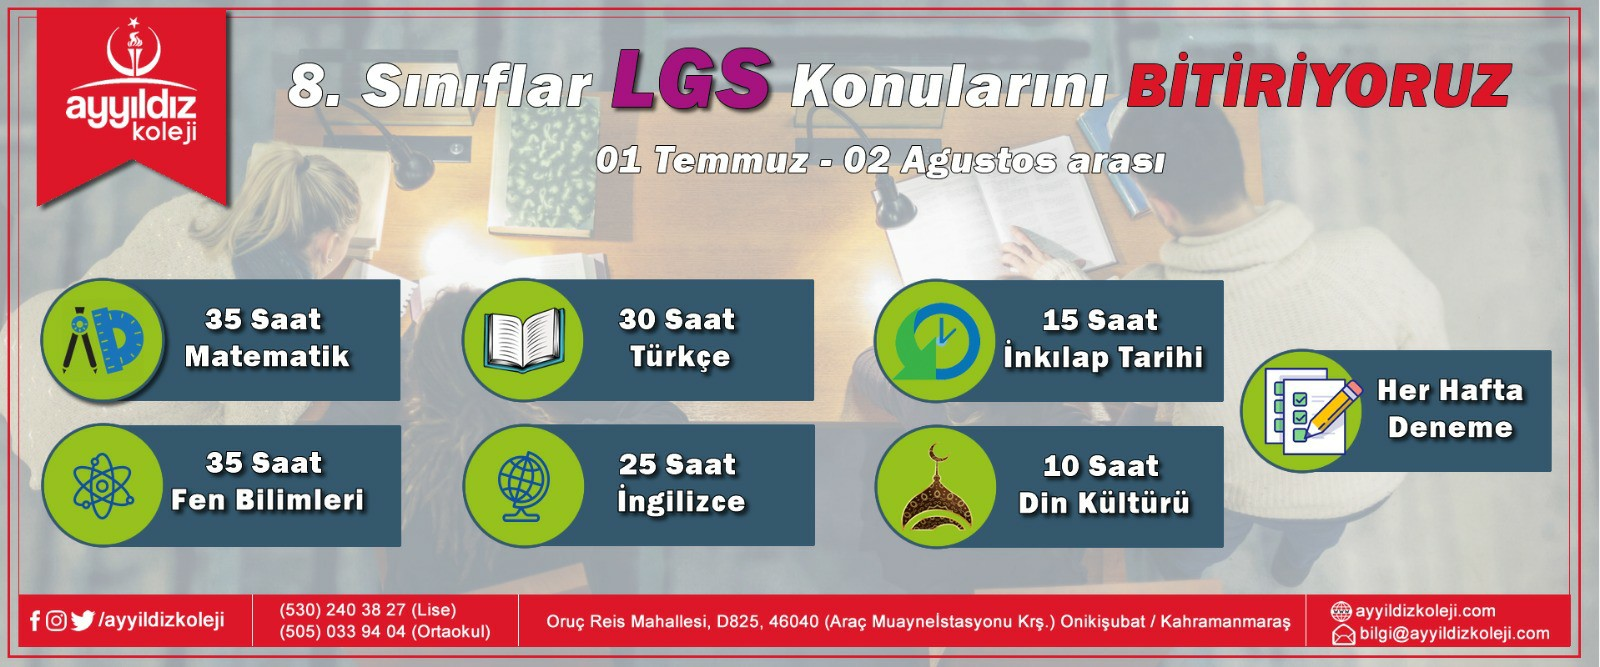 LGS KAMPI BAŞLADI